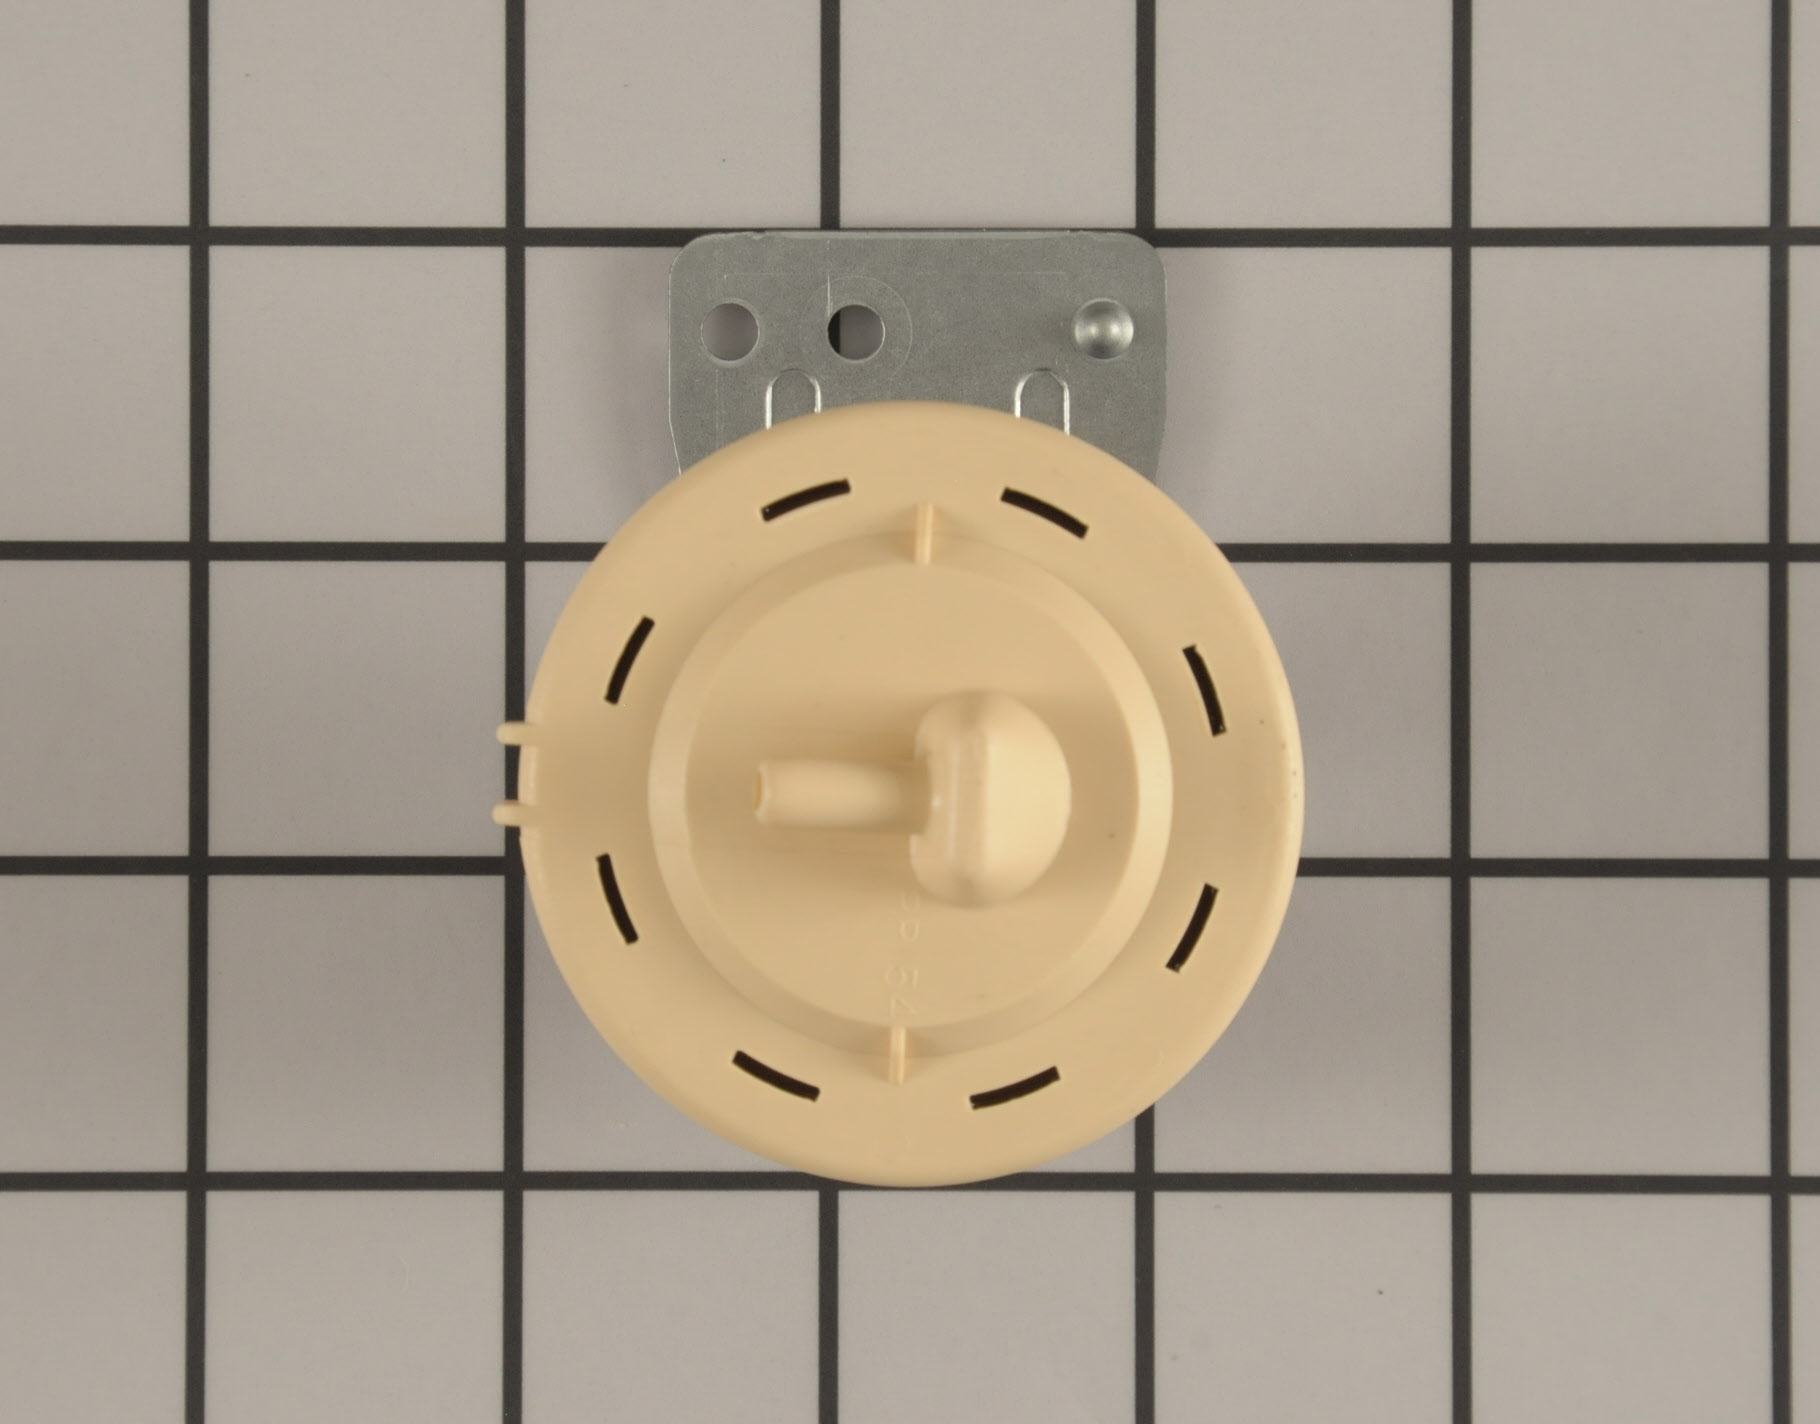 LG Washing Machine Part # 6600FA1704X - Pressure Switch